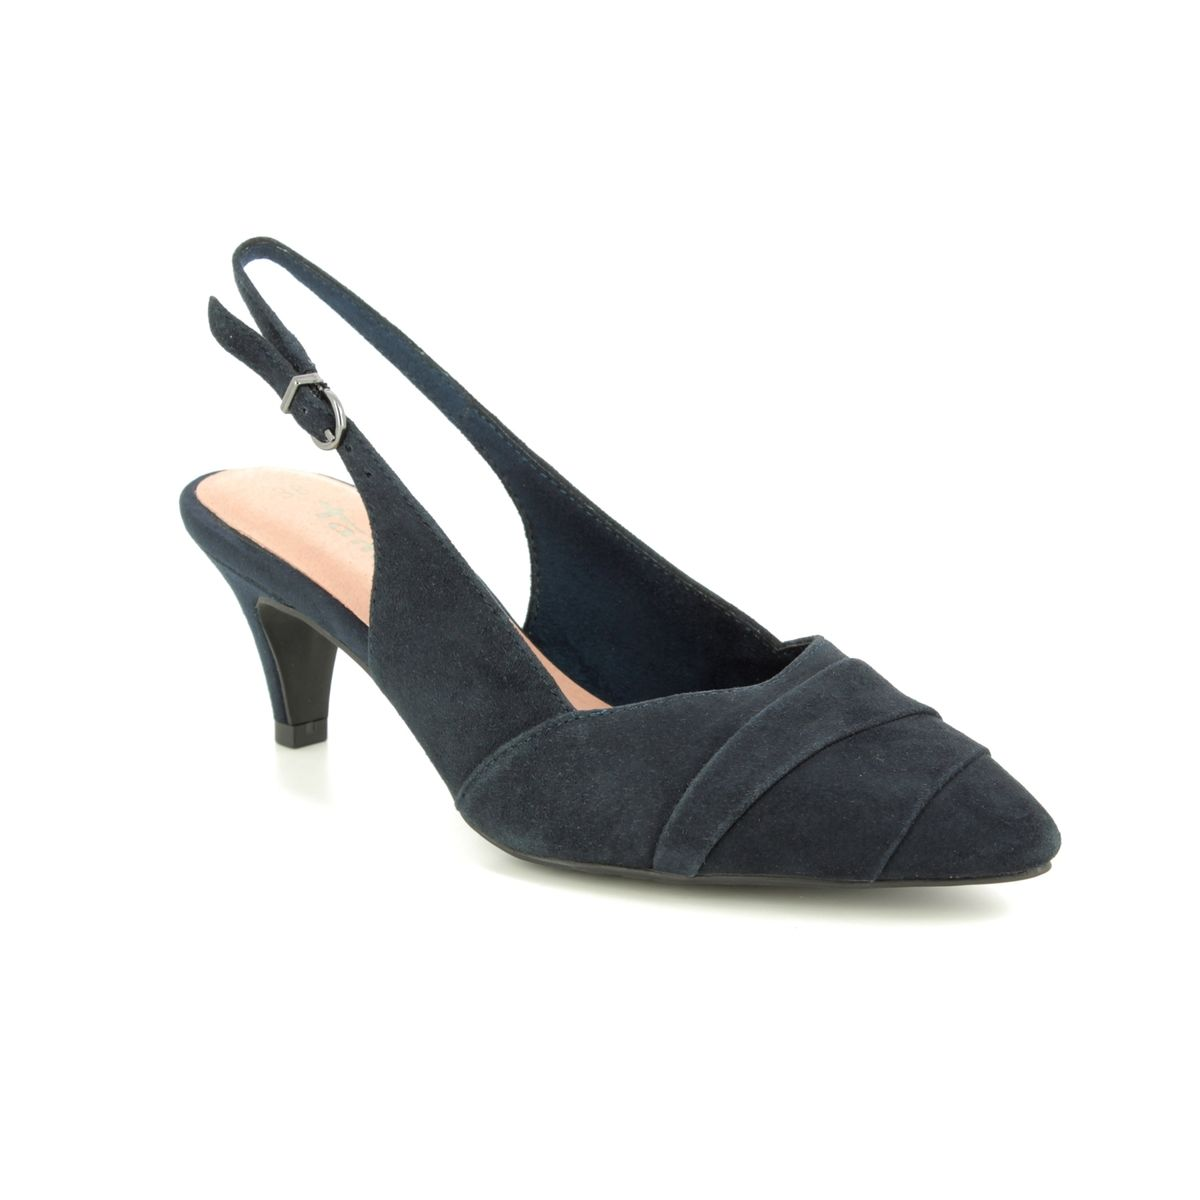 212f5b85547 Tamaris Slingback Shoes - Navy suede - 29616 32 805 FATSIA SLING